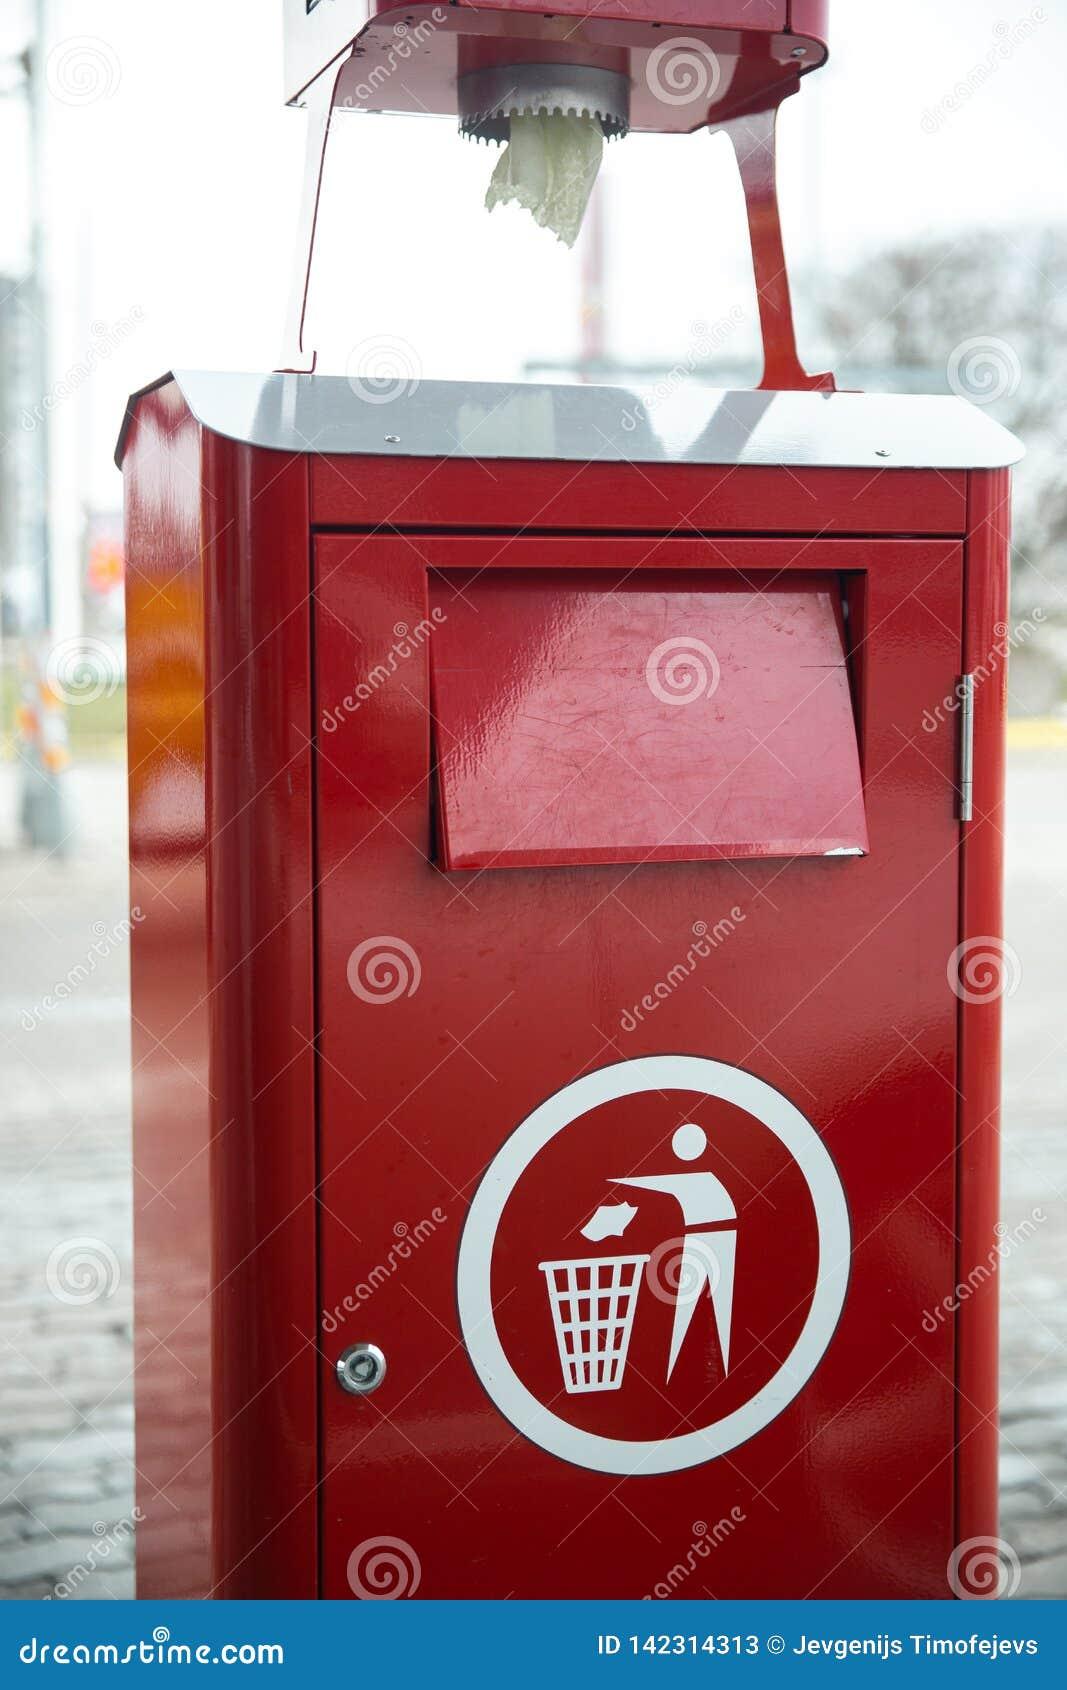 Red bright metal trash bin at a gas station